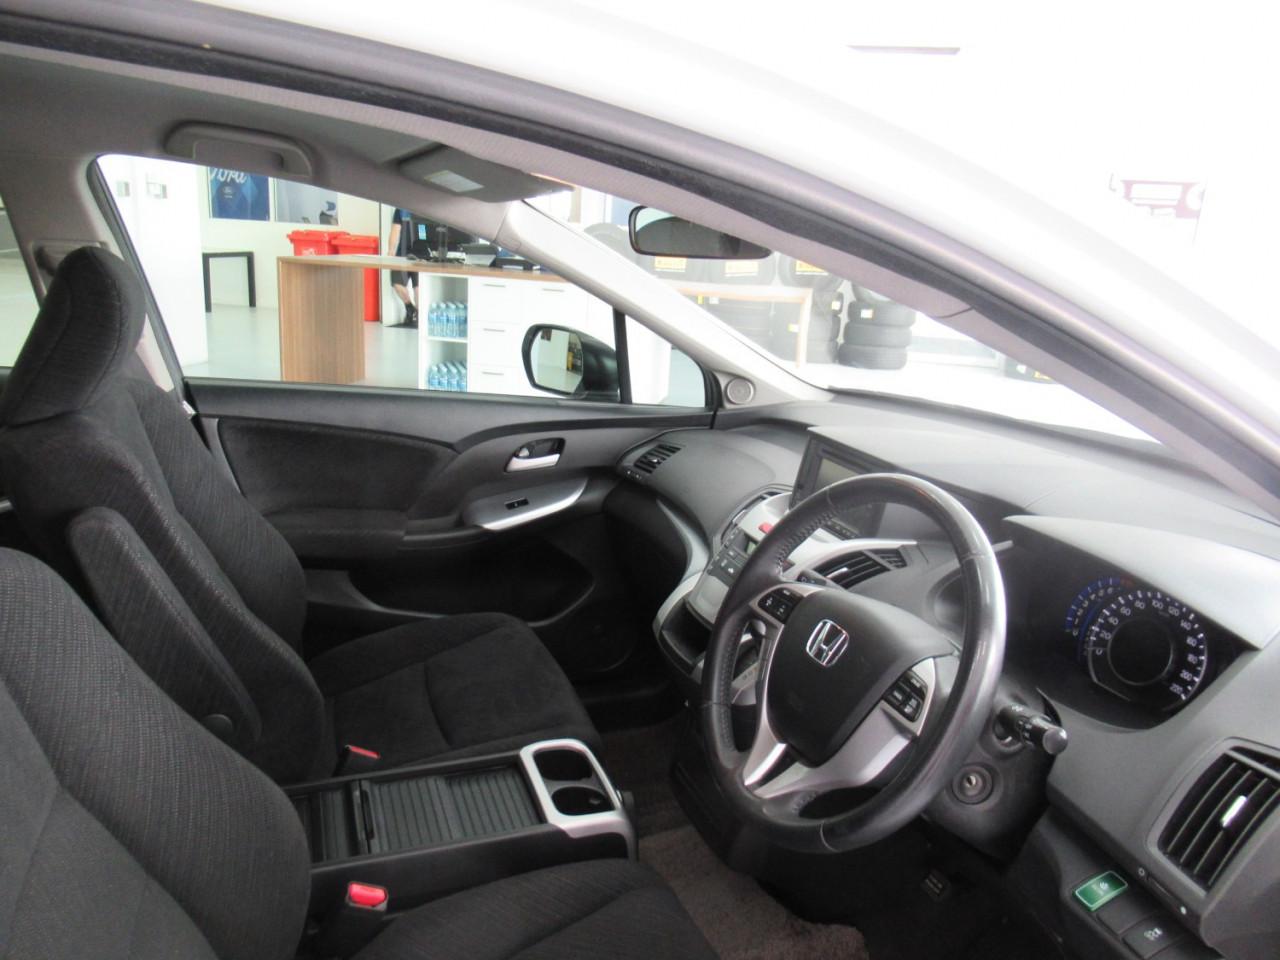 2013 Honda Odyssey 4TH GEN MY13 Wagon Image 12